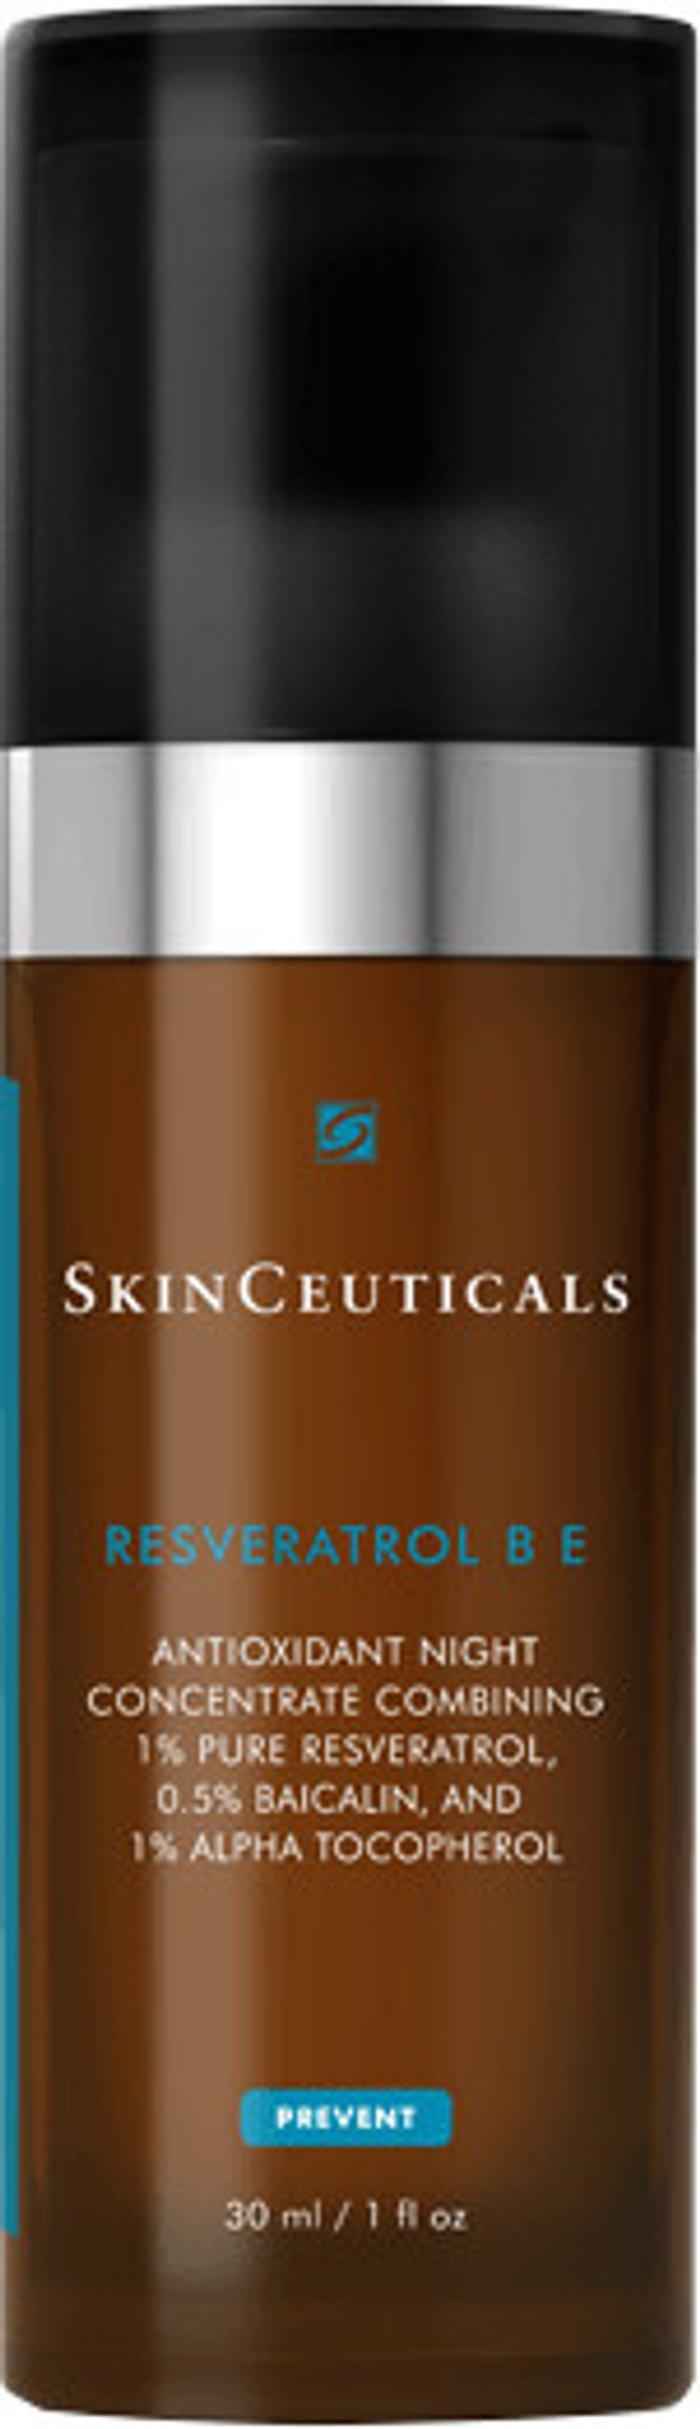 SkinCeuticals SkinCeuticals Resveratrol B E (30ml)